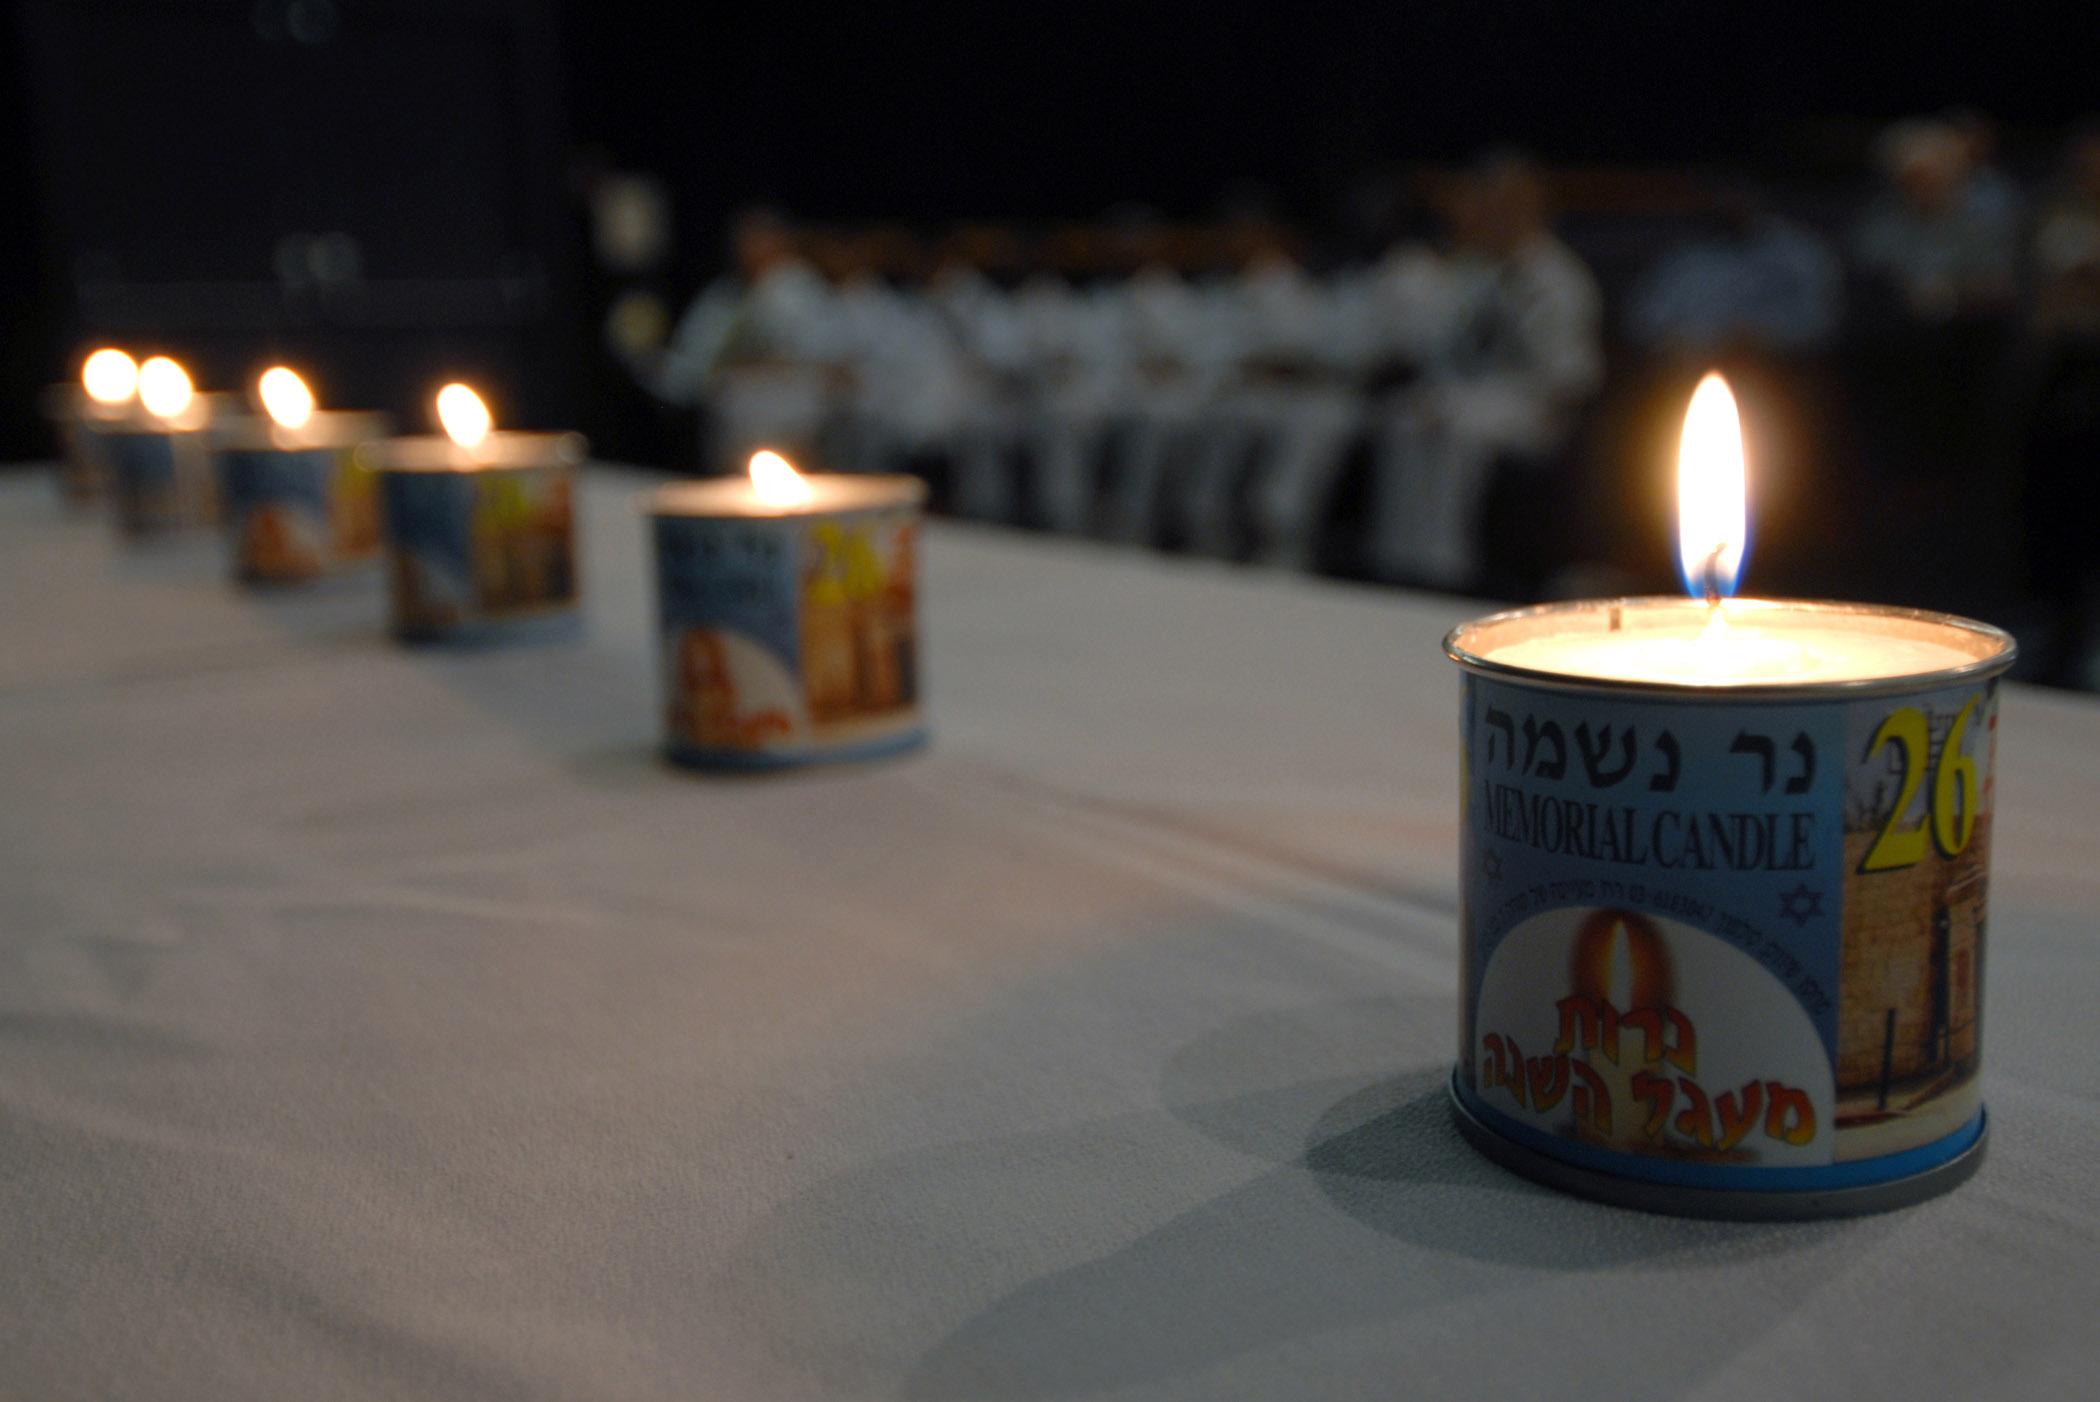 Yahrzeit Candle Wikipedia